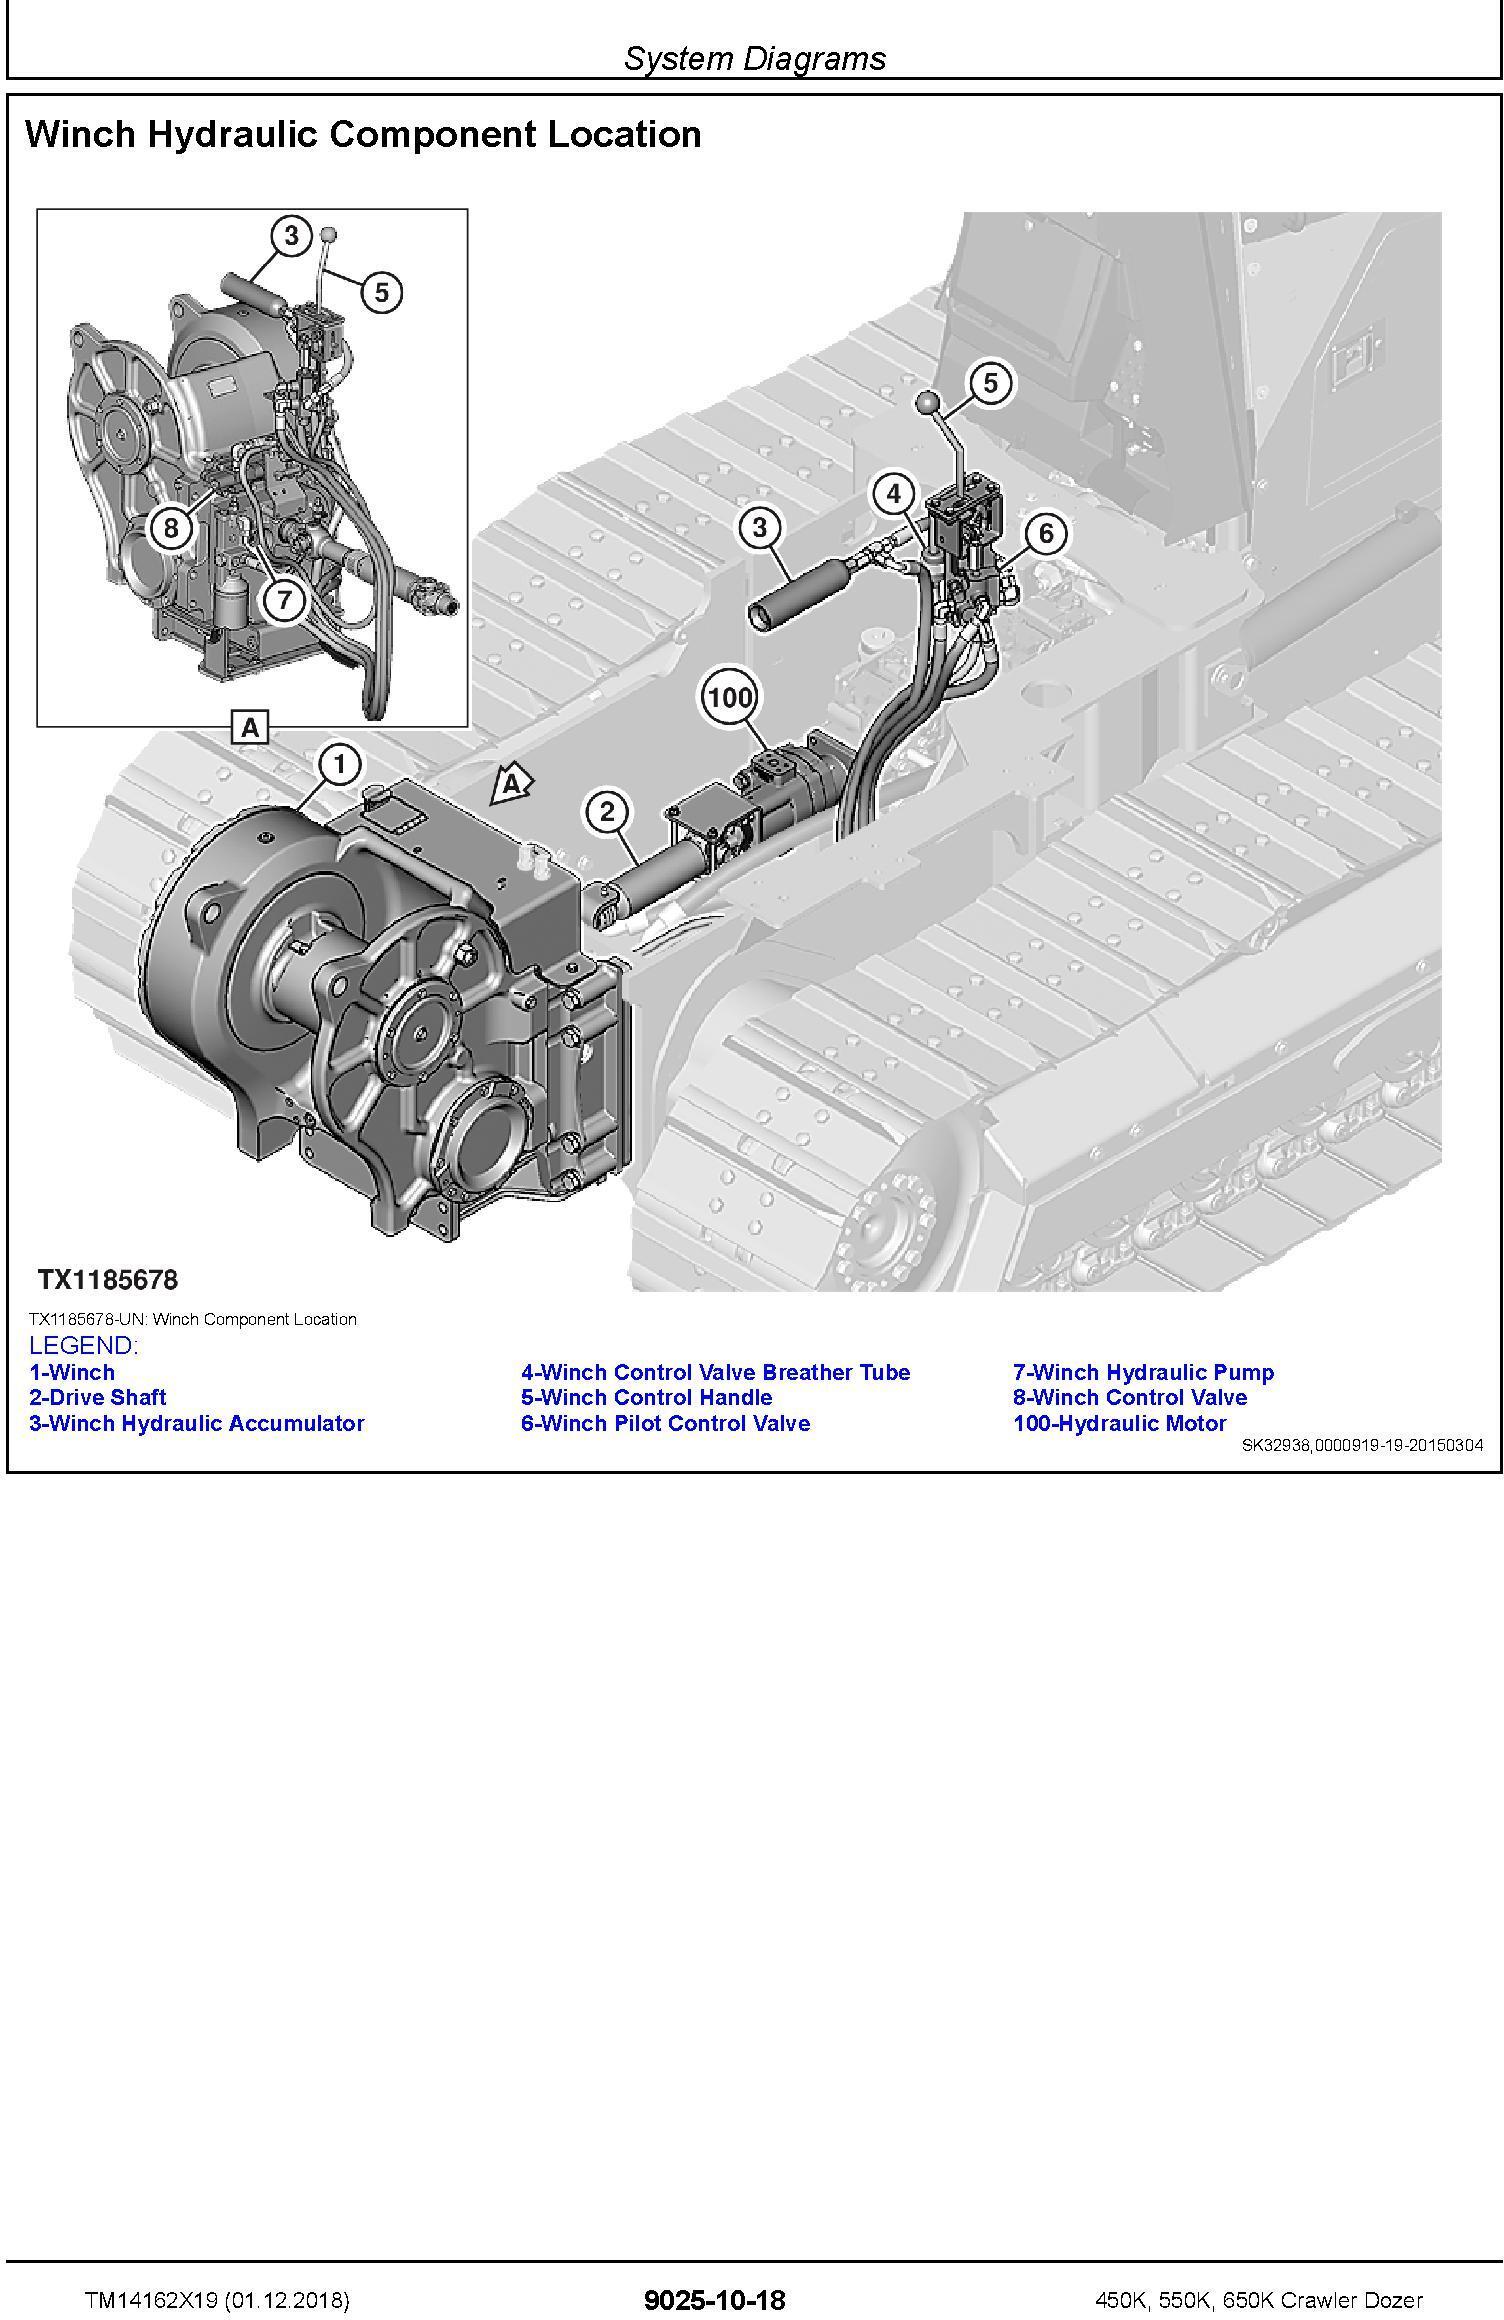 John Deere 450K, 550K, 650K (SN. F305399-) Crawler Dozer Diagnostic Technical Manual (TM14162X19) - 1